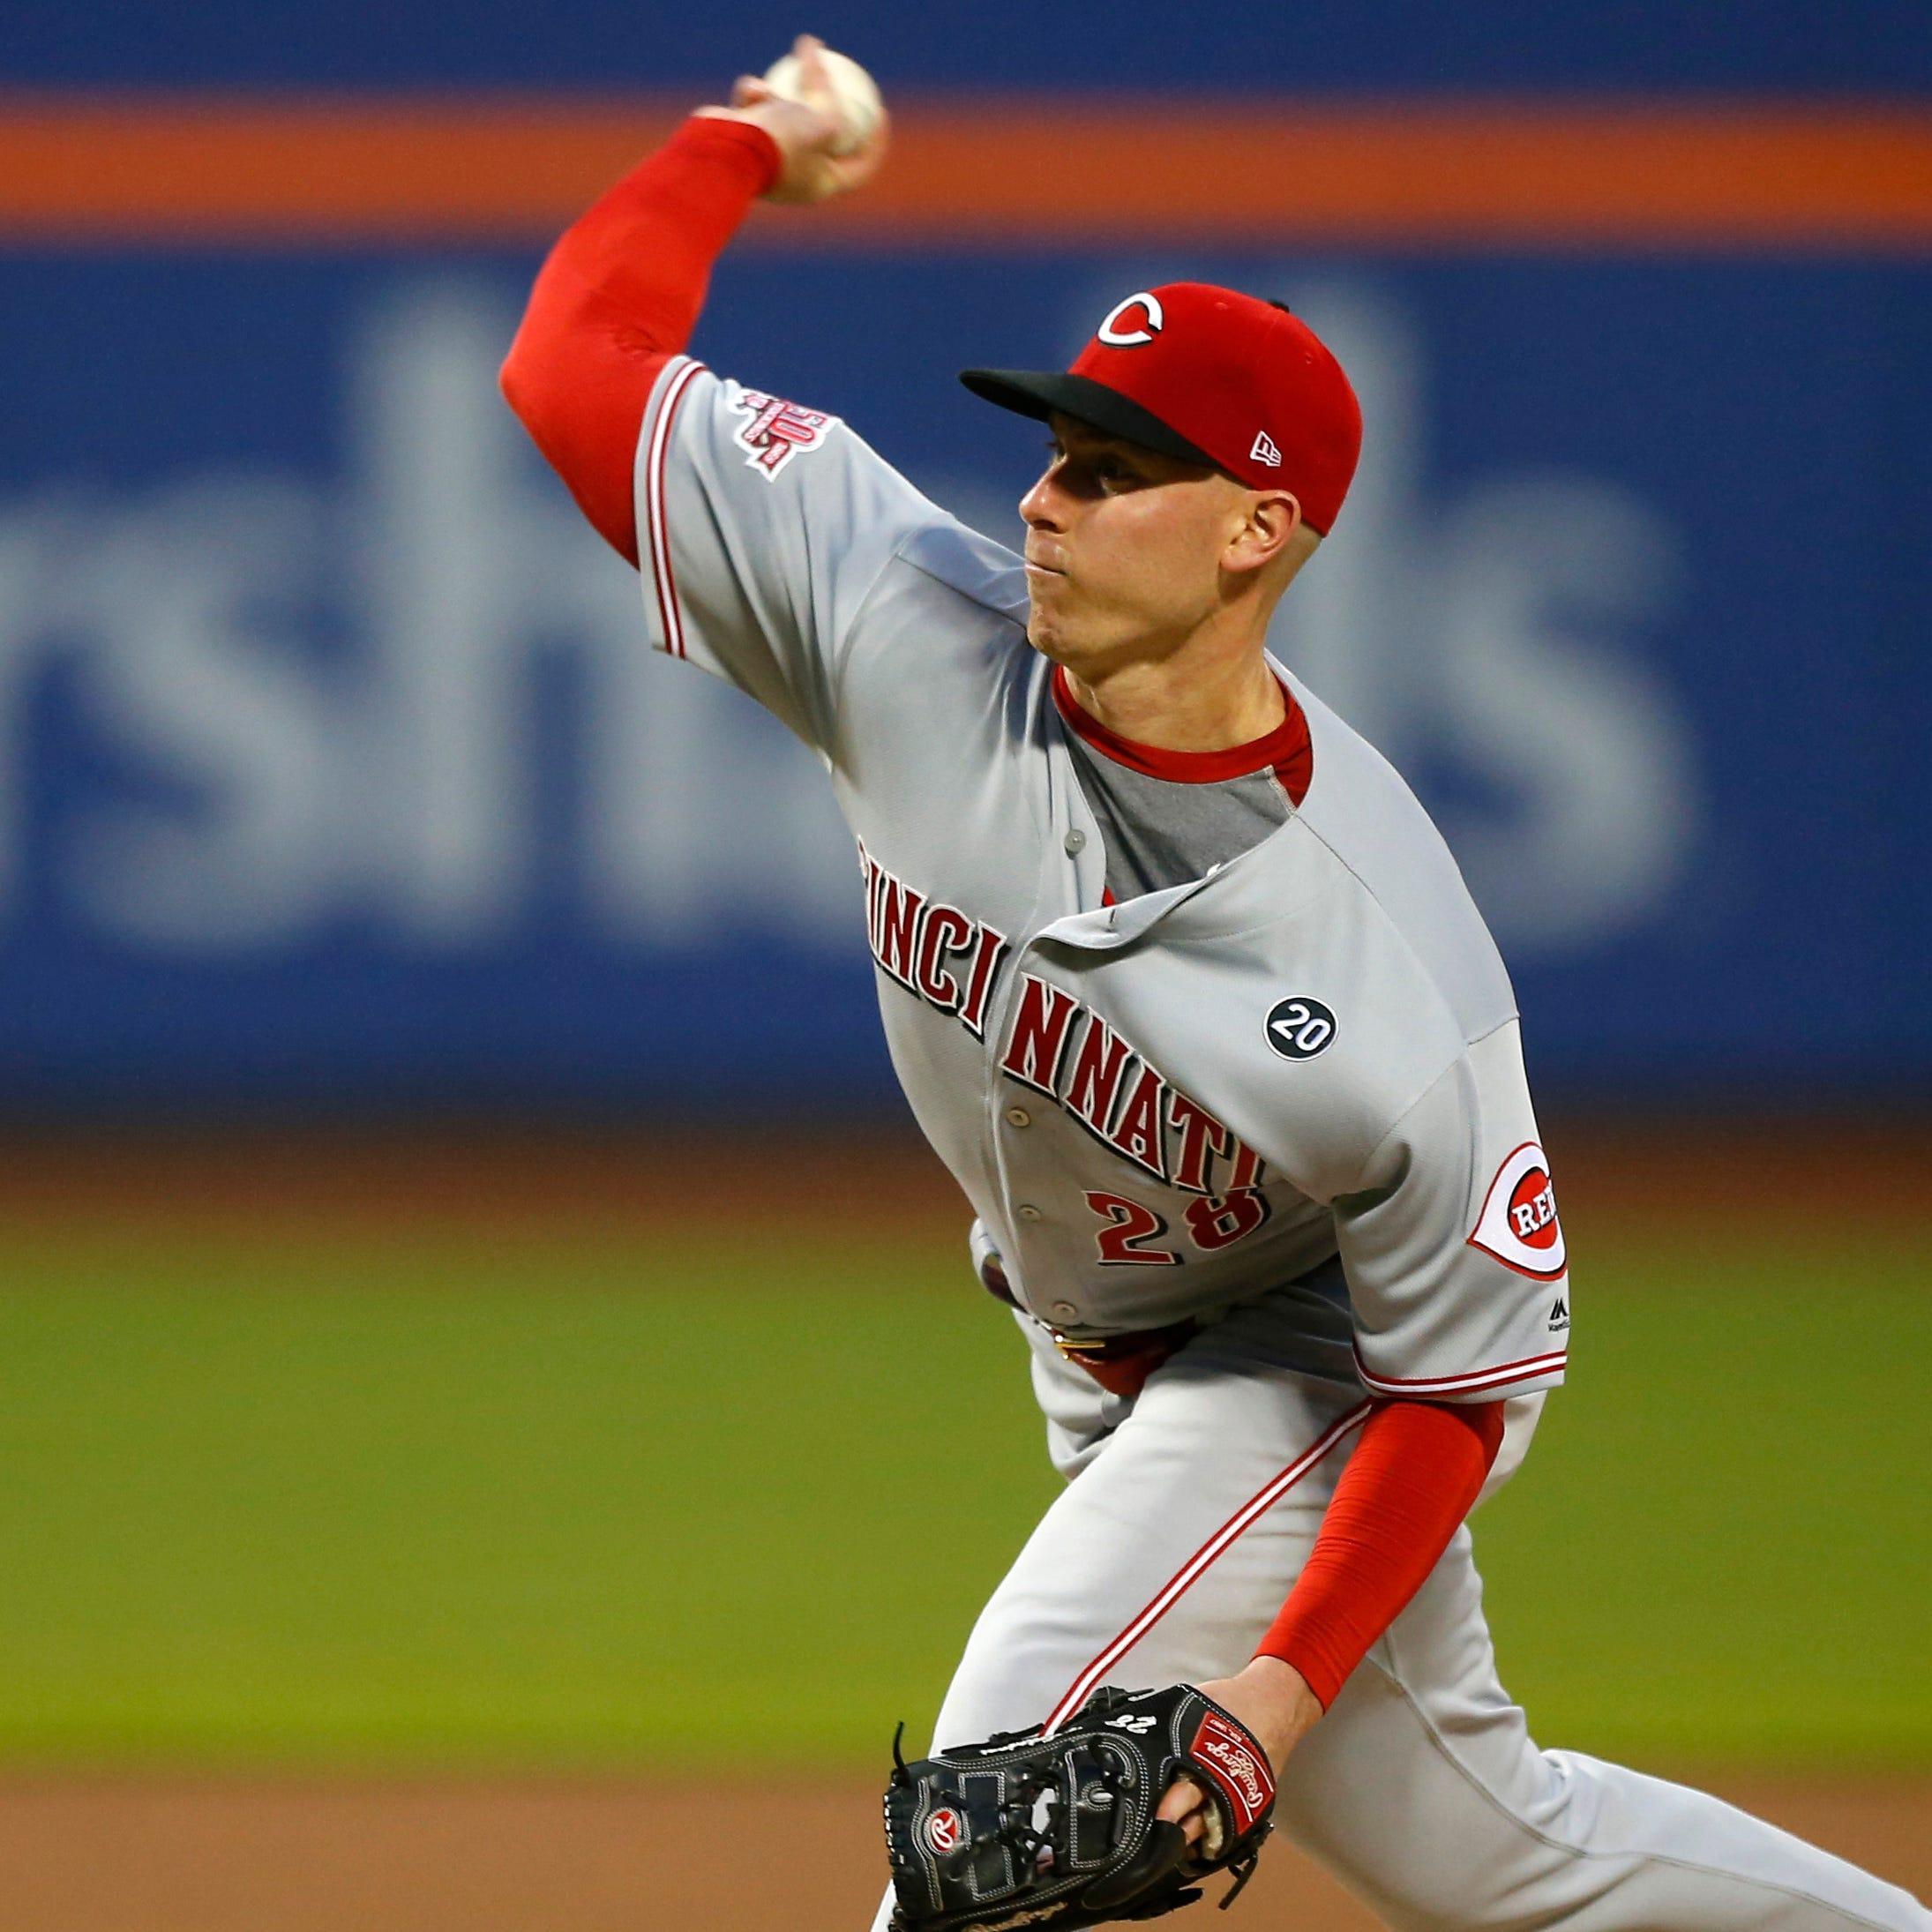 Cincinnati Reds shortstop José Iglesias stuns New York Mets with 9th-inning home run